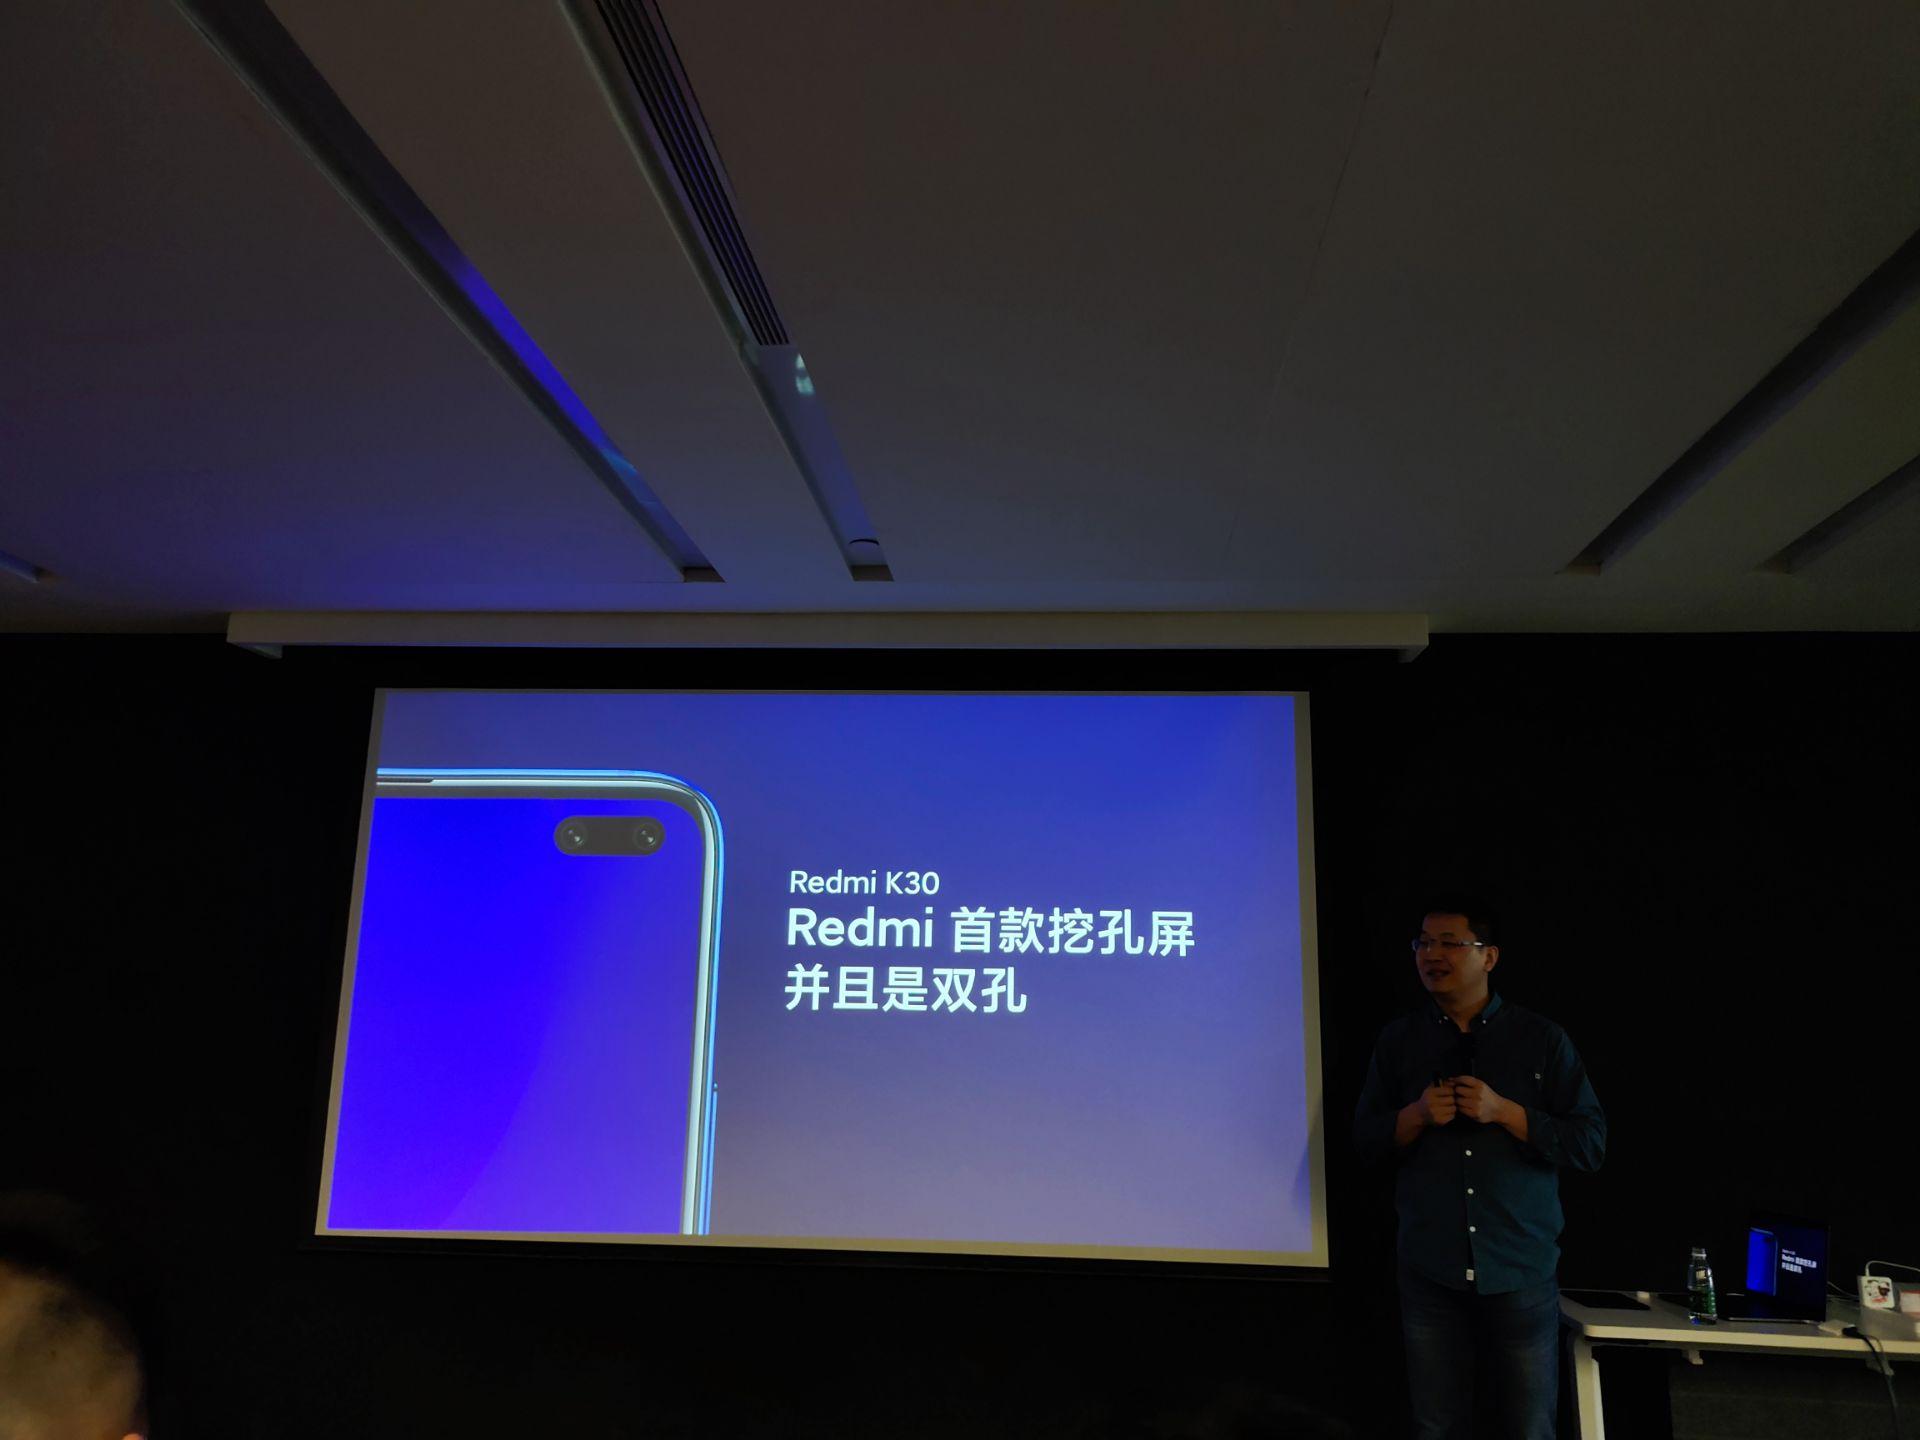 Redmi首款5G手机官宣:双模/前置挖孔双摄